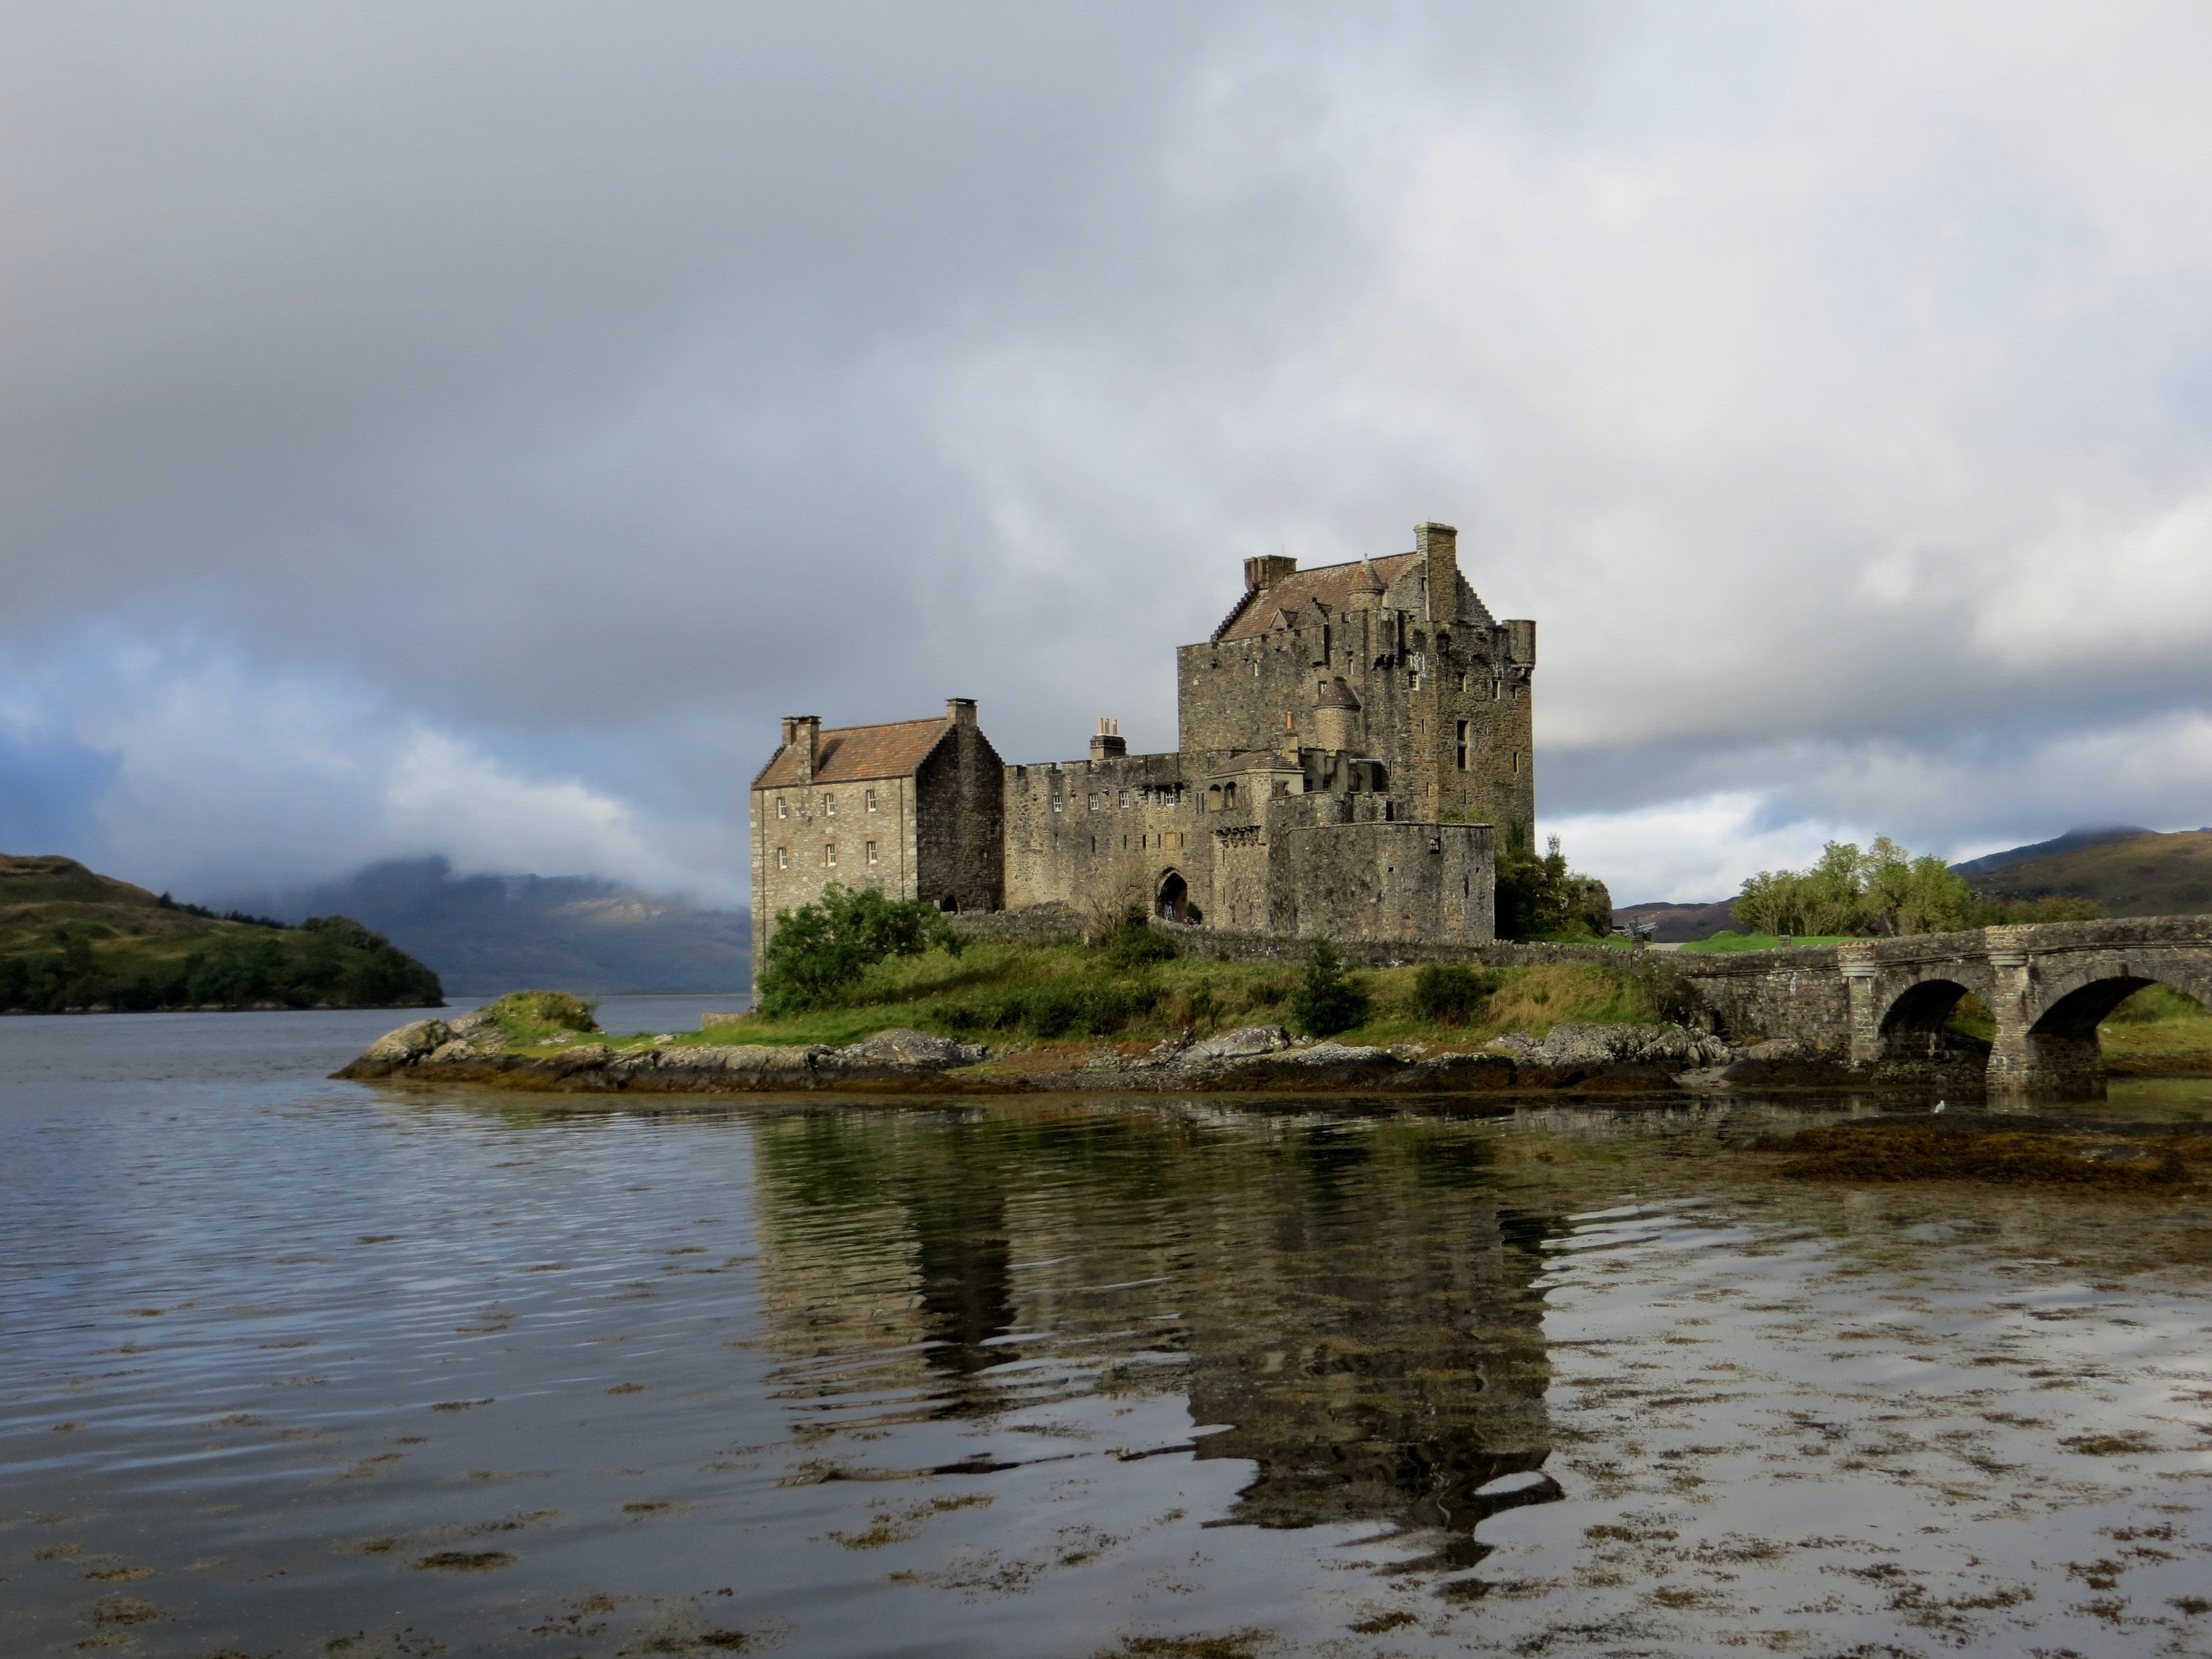 Scotland 9 by LeikyaStock